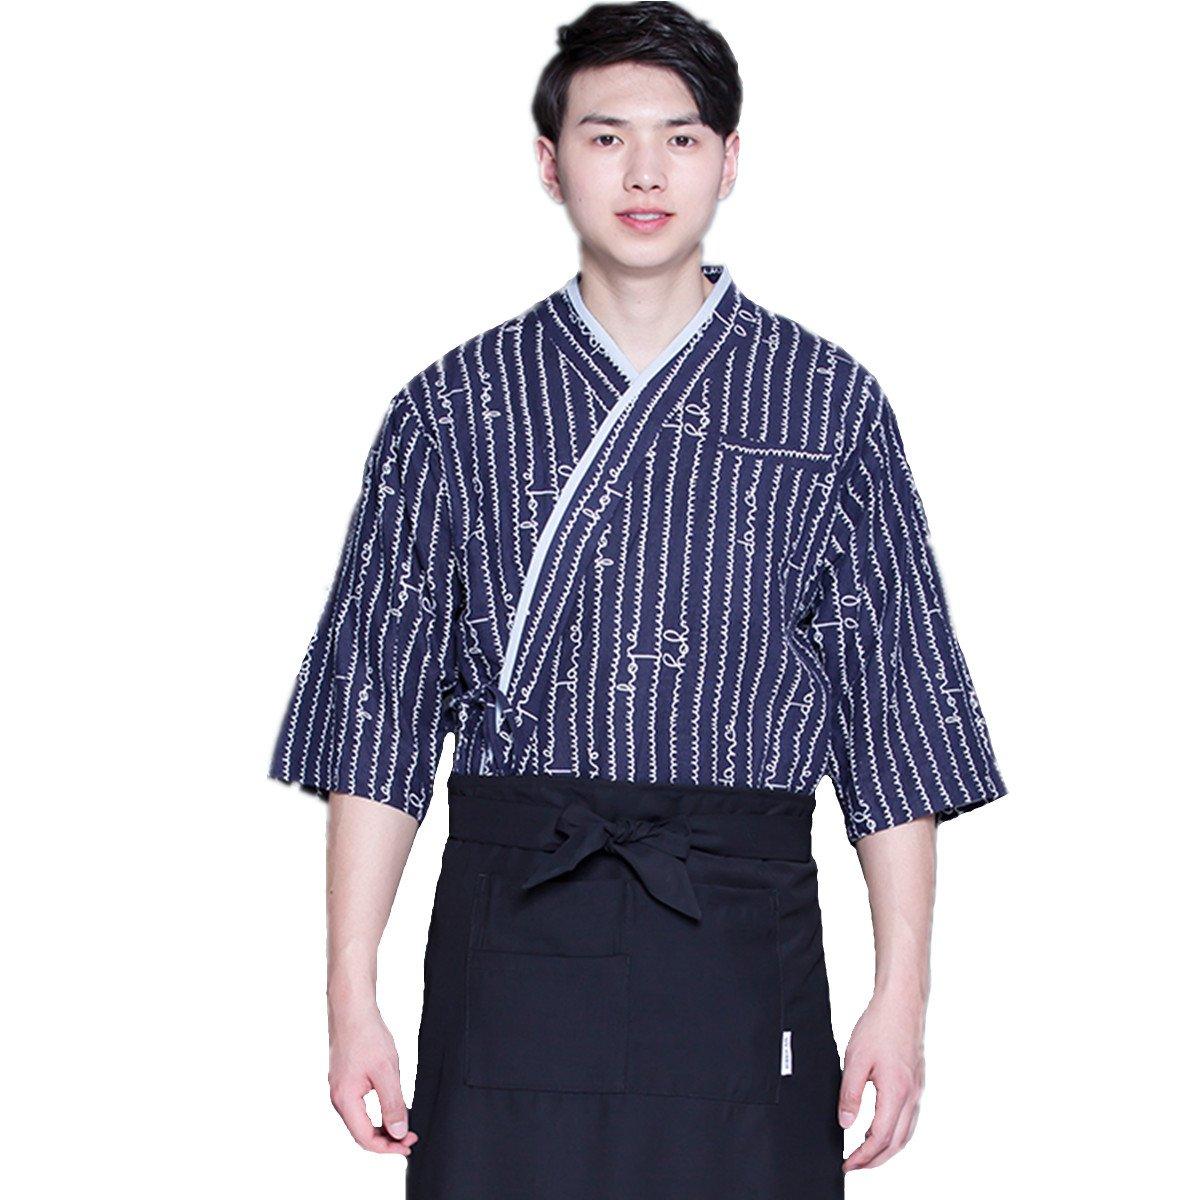 XINFU Sushi Chef Uniform Blue Waves 3/4 Long Sleeve Restaurant Japanese Kitchen Work Coat by XINFU